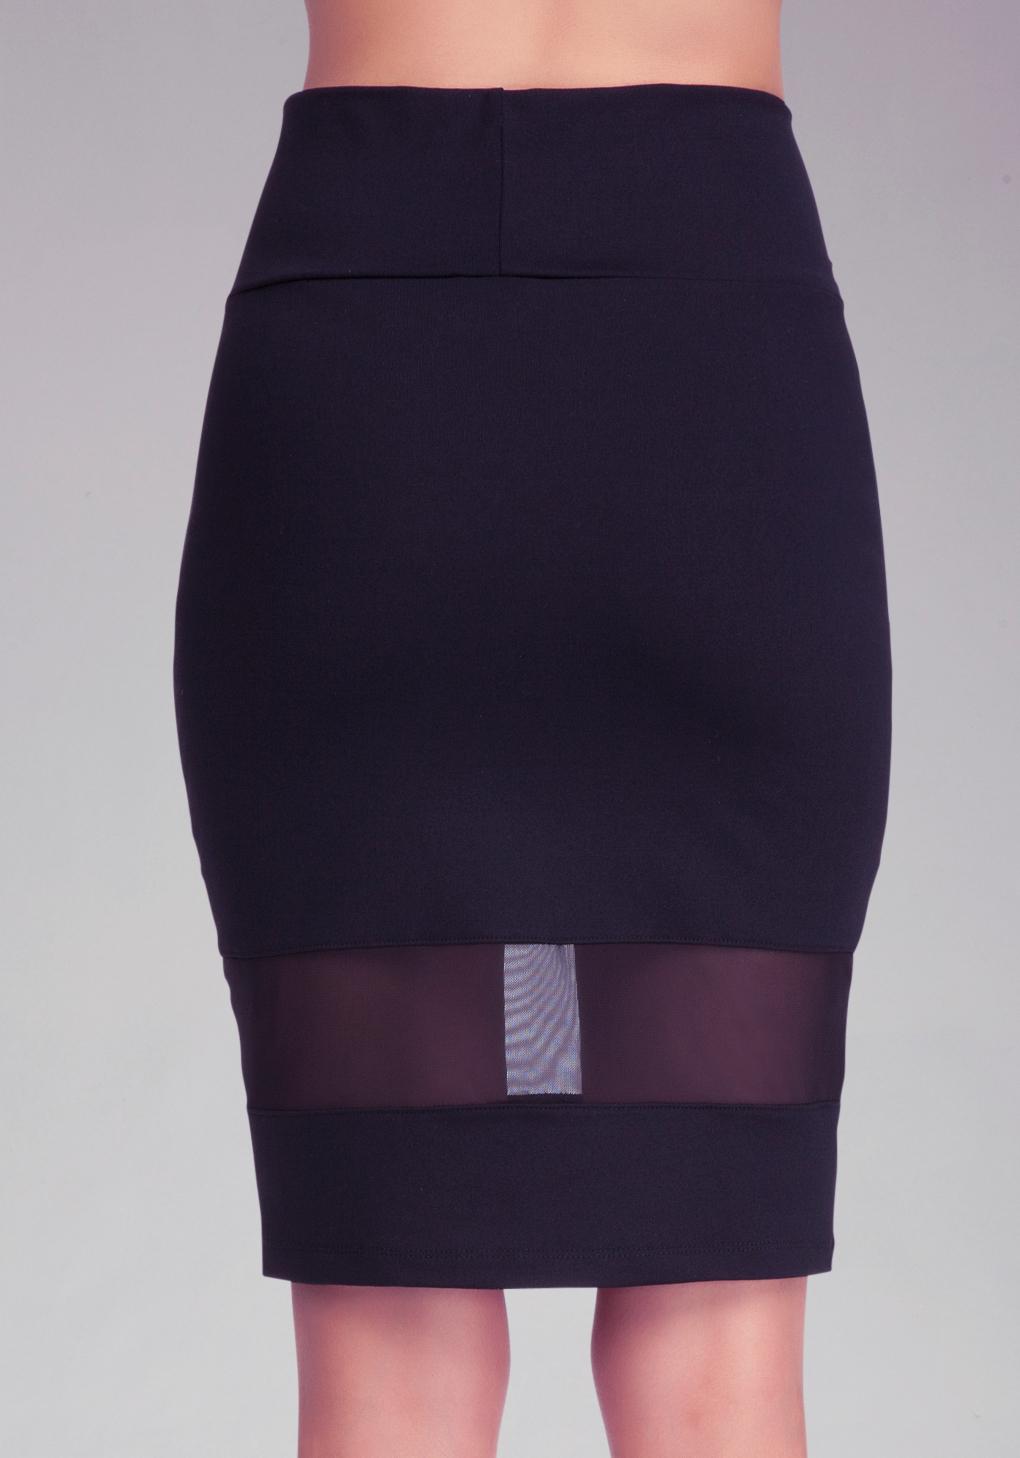 bebe mesh panel pencil skirt in black lyst